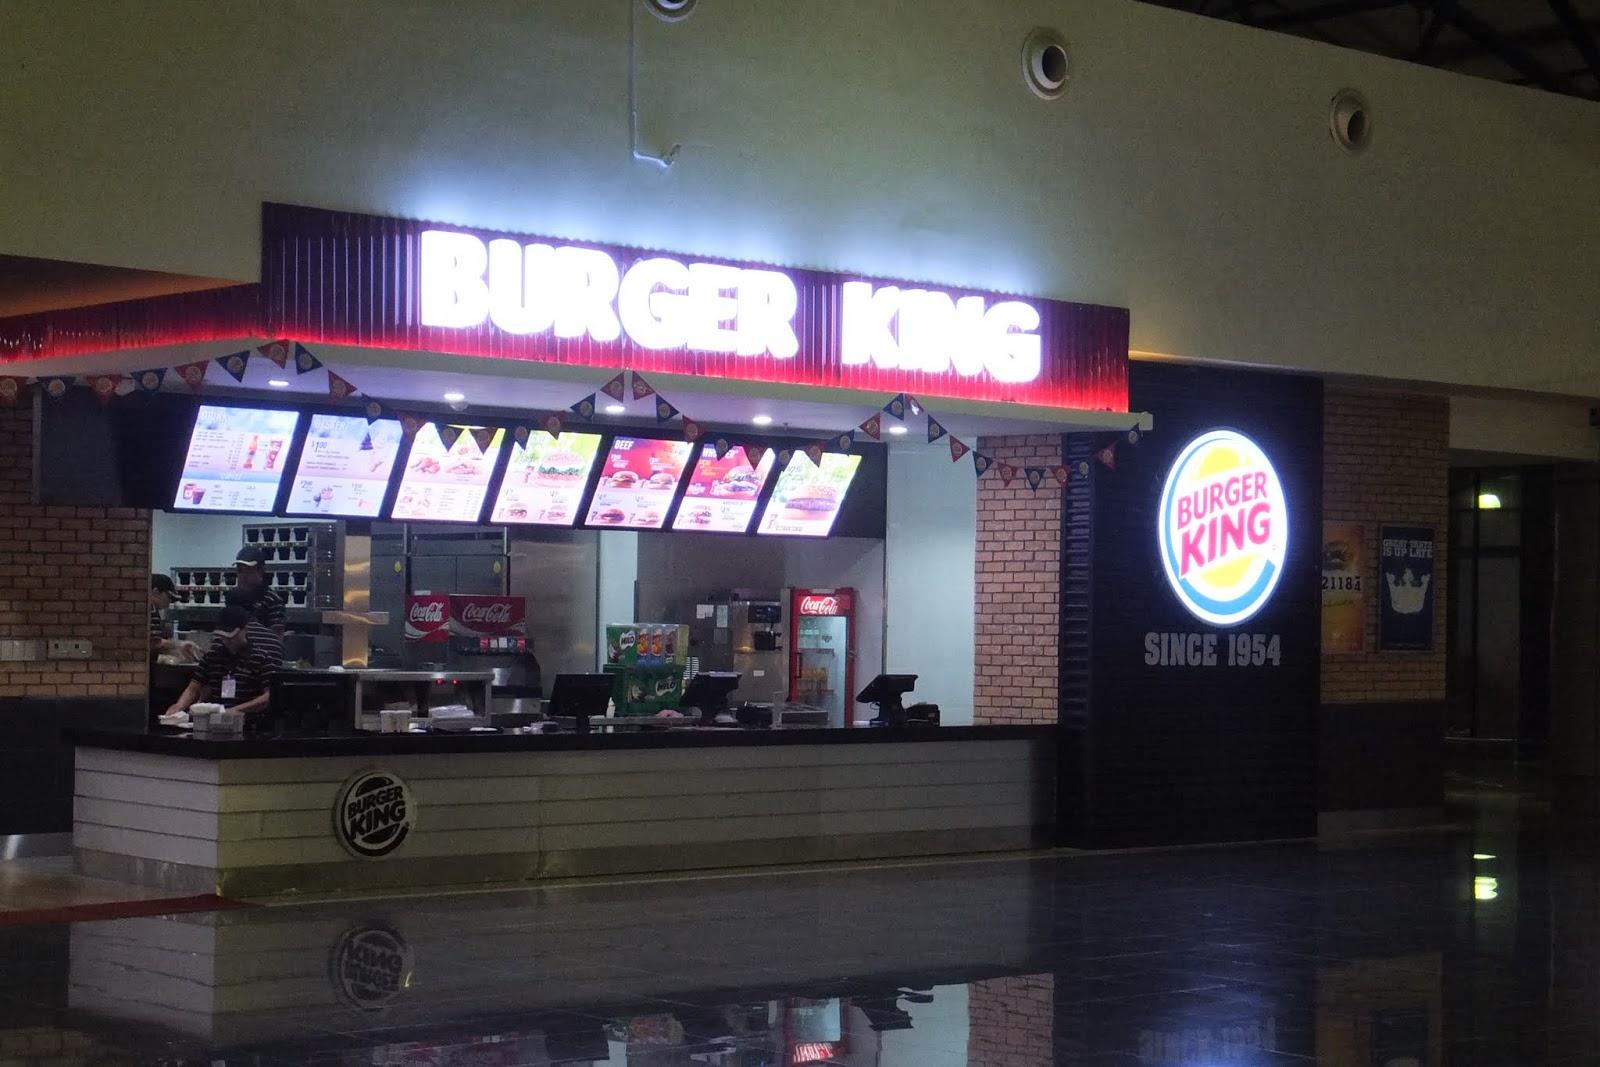 Burgerking-noibaiairport-hanoi ノイバイ国際空港のバーガーキング